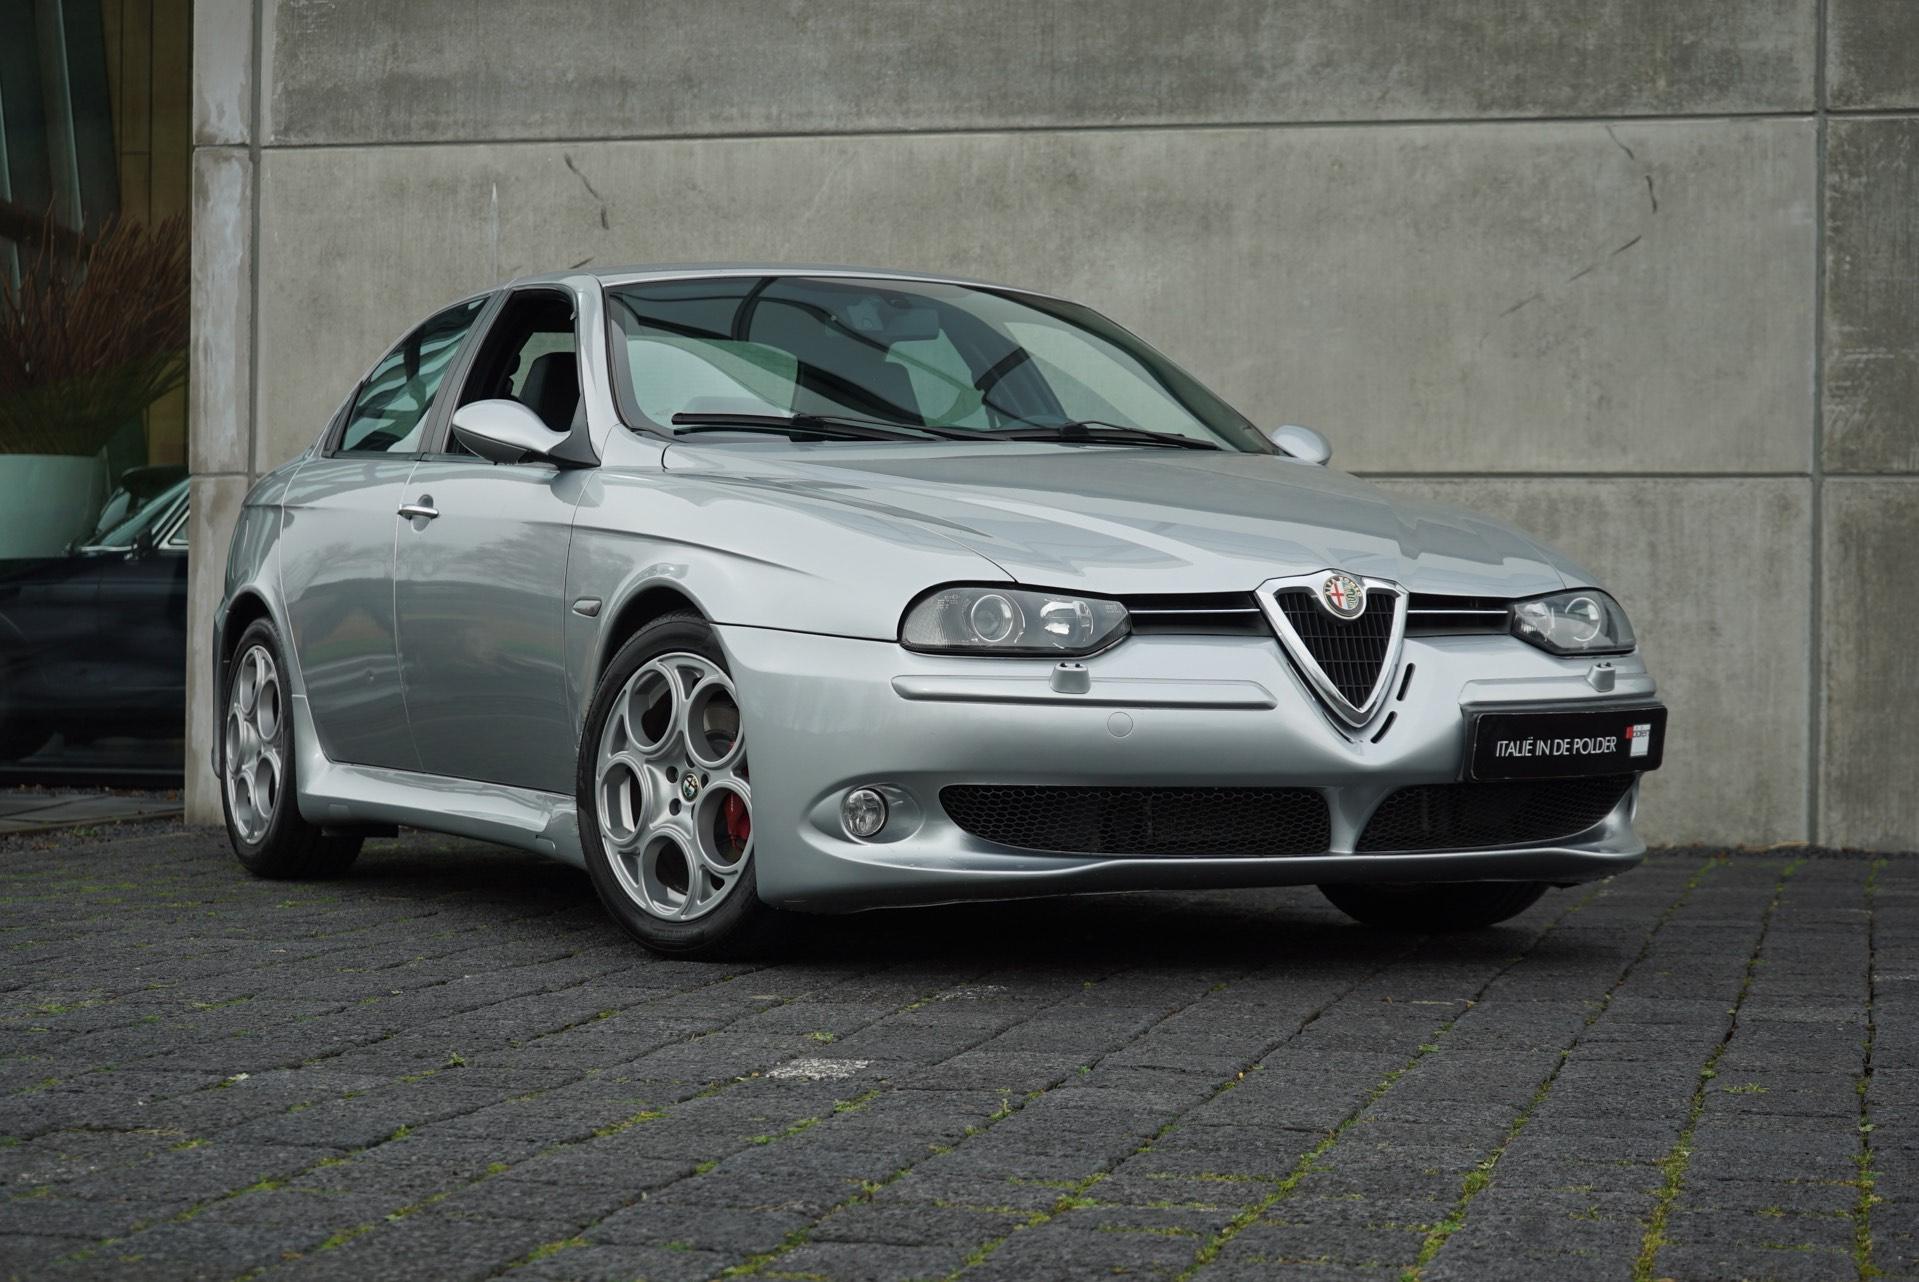 ALFA 156 3.2 V6 GTA  Grigio Sterling